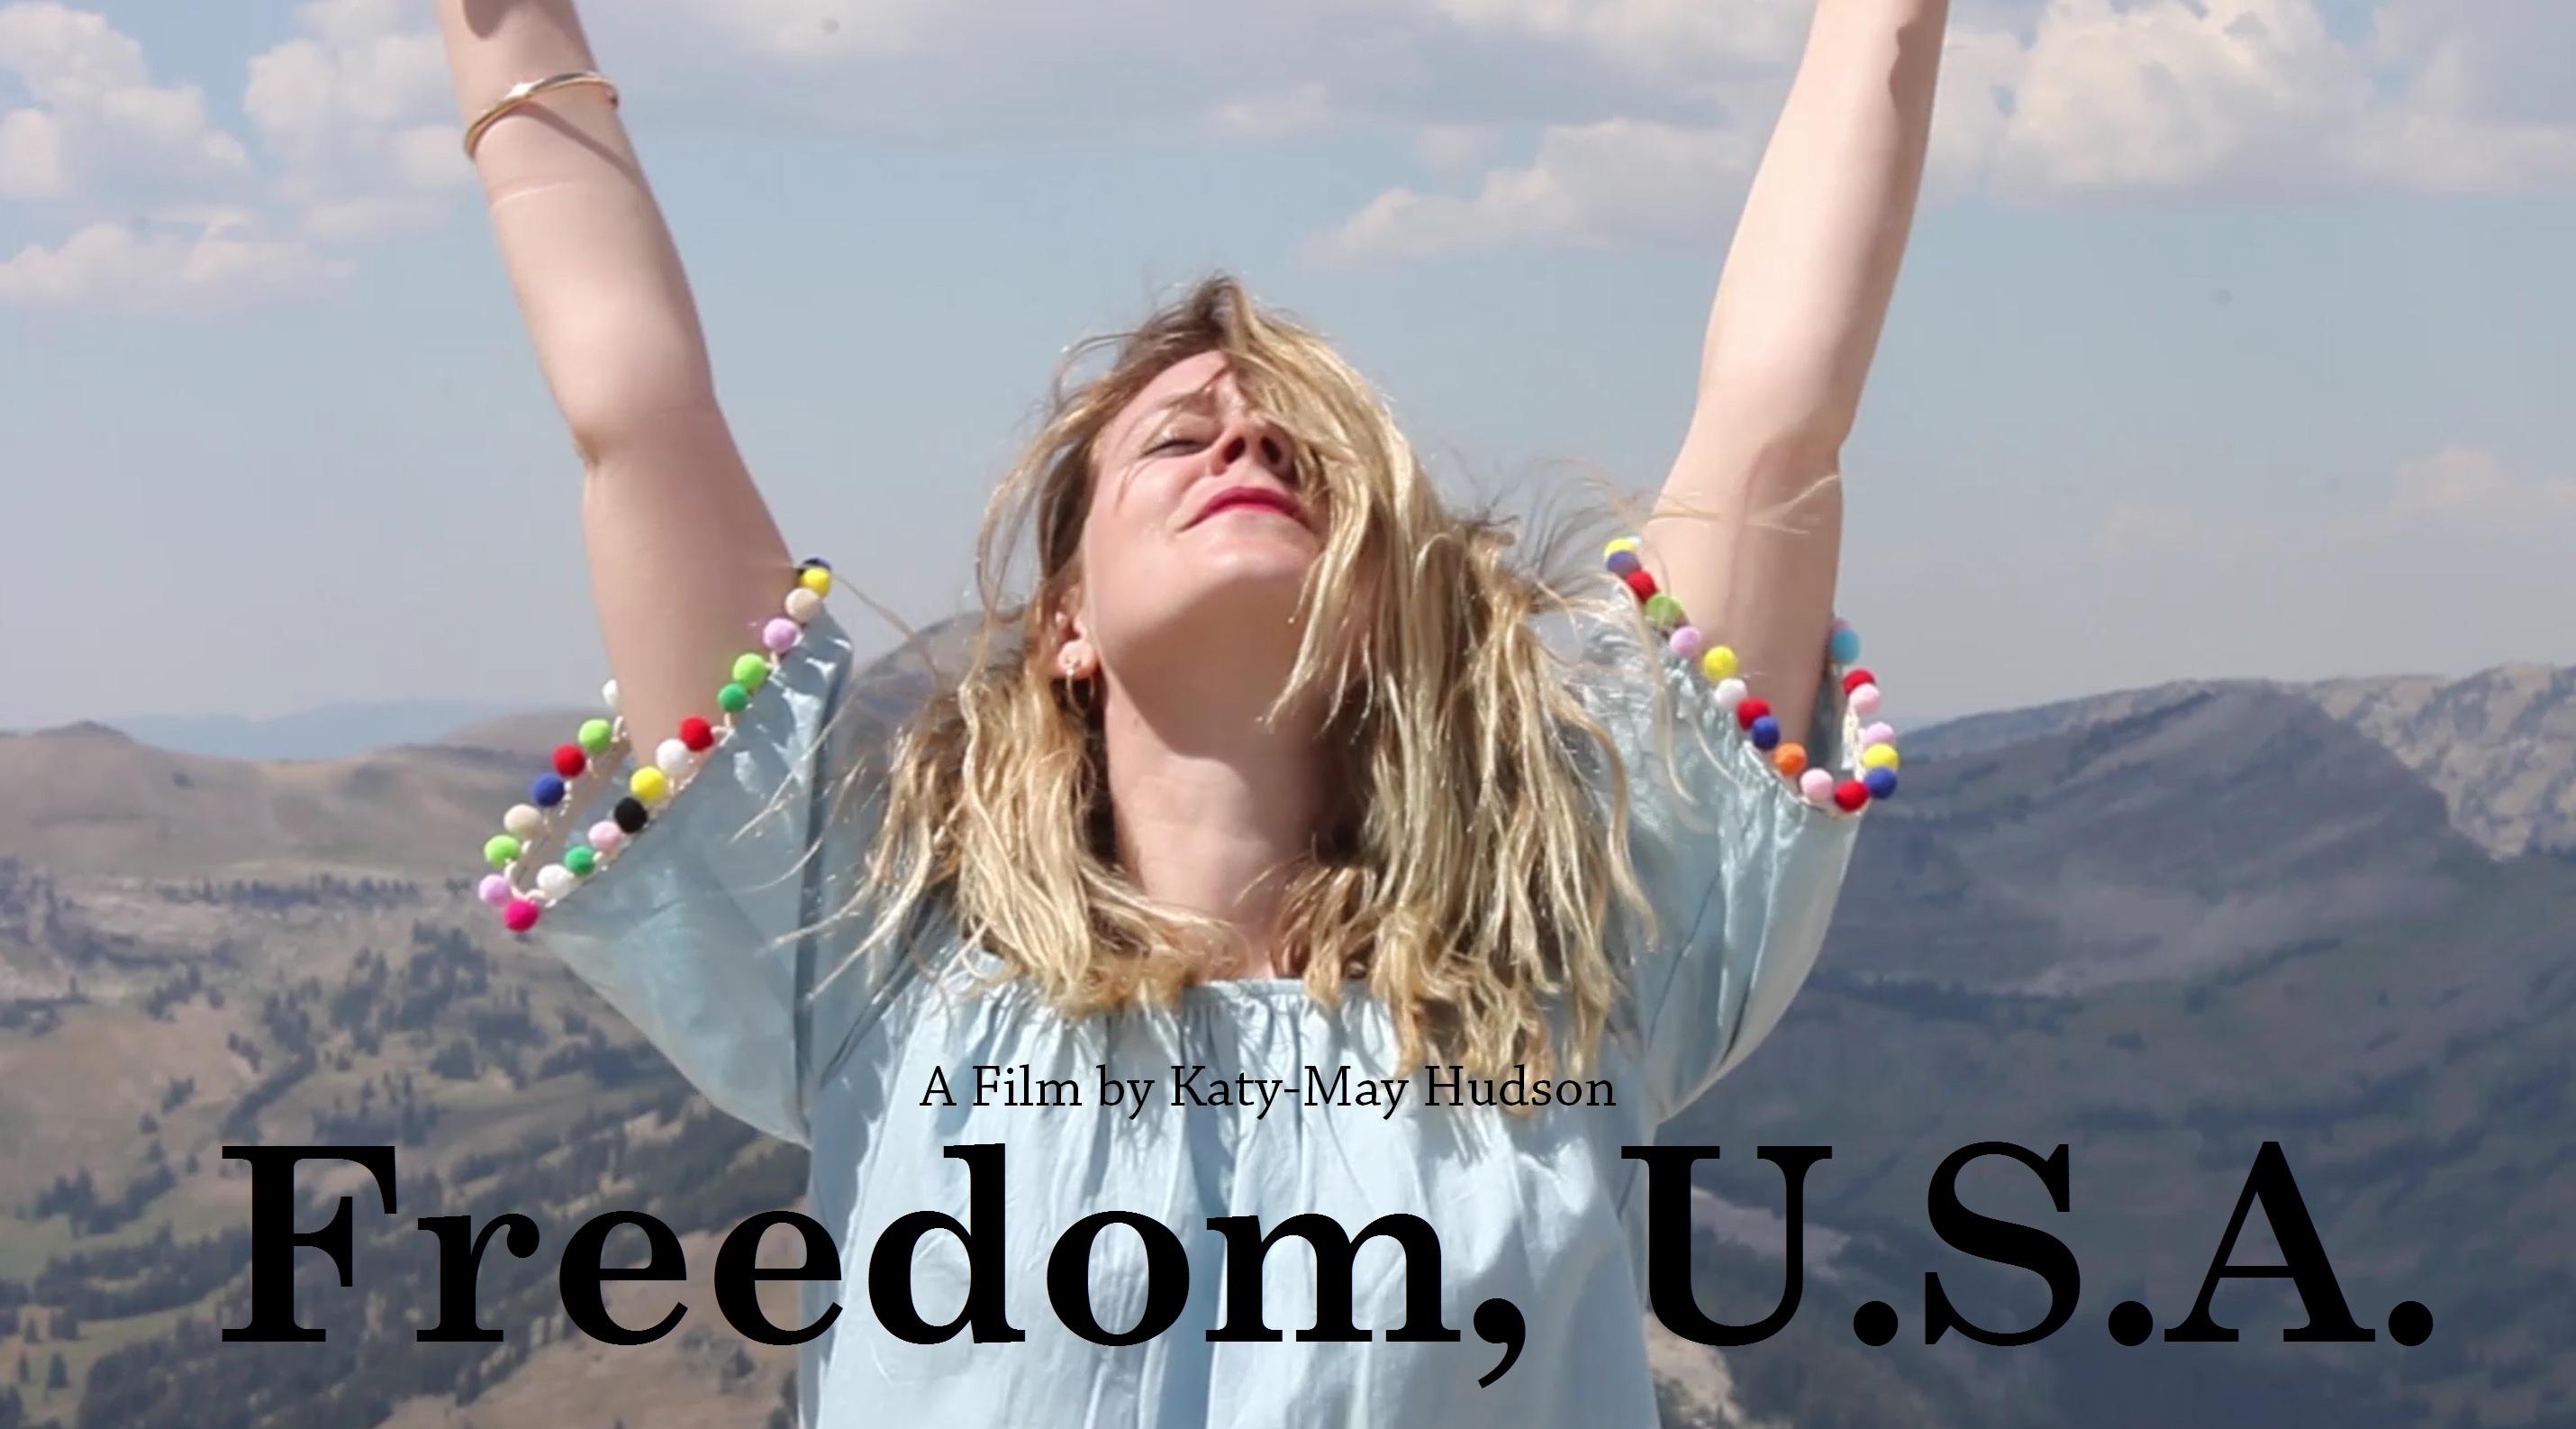 Freedom, U.S.A.